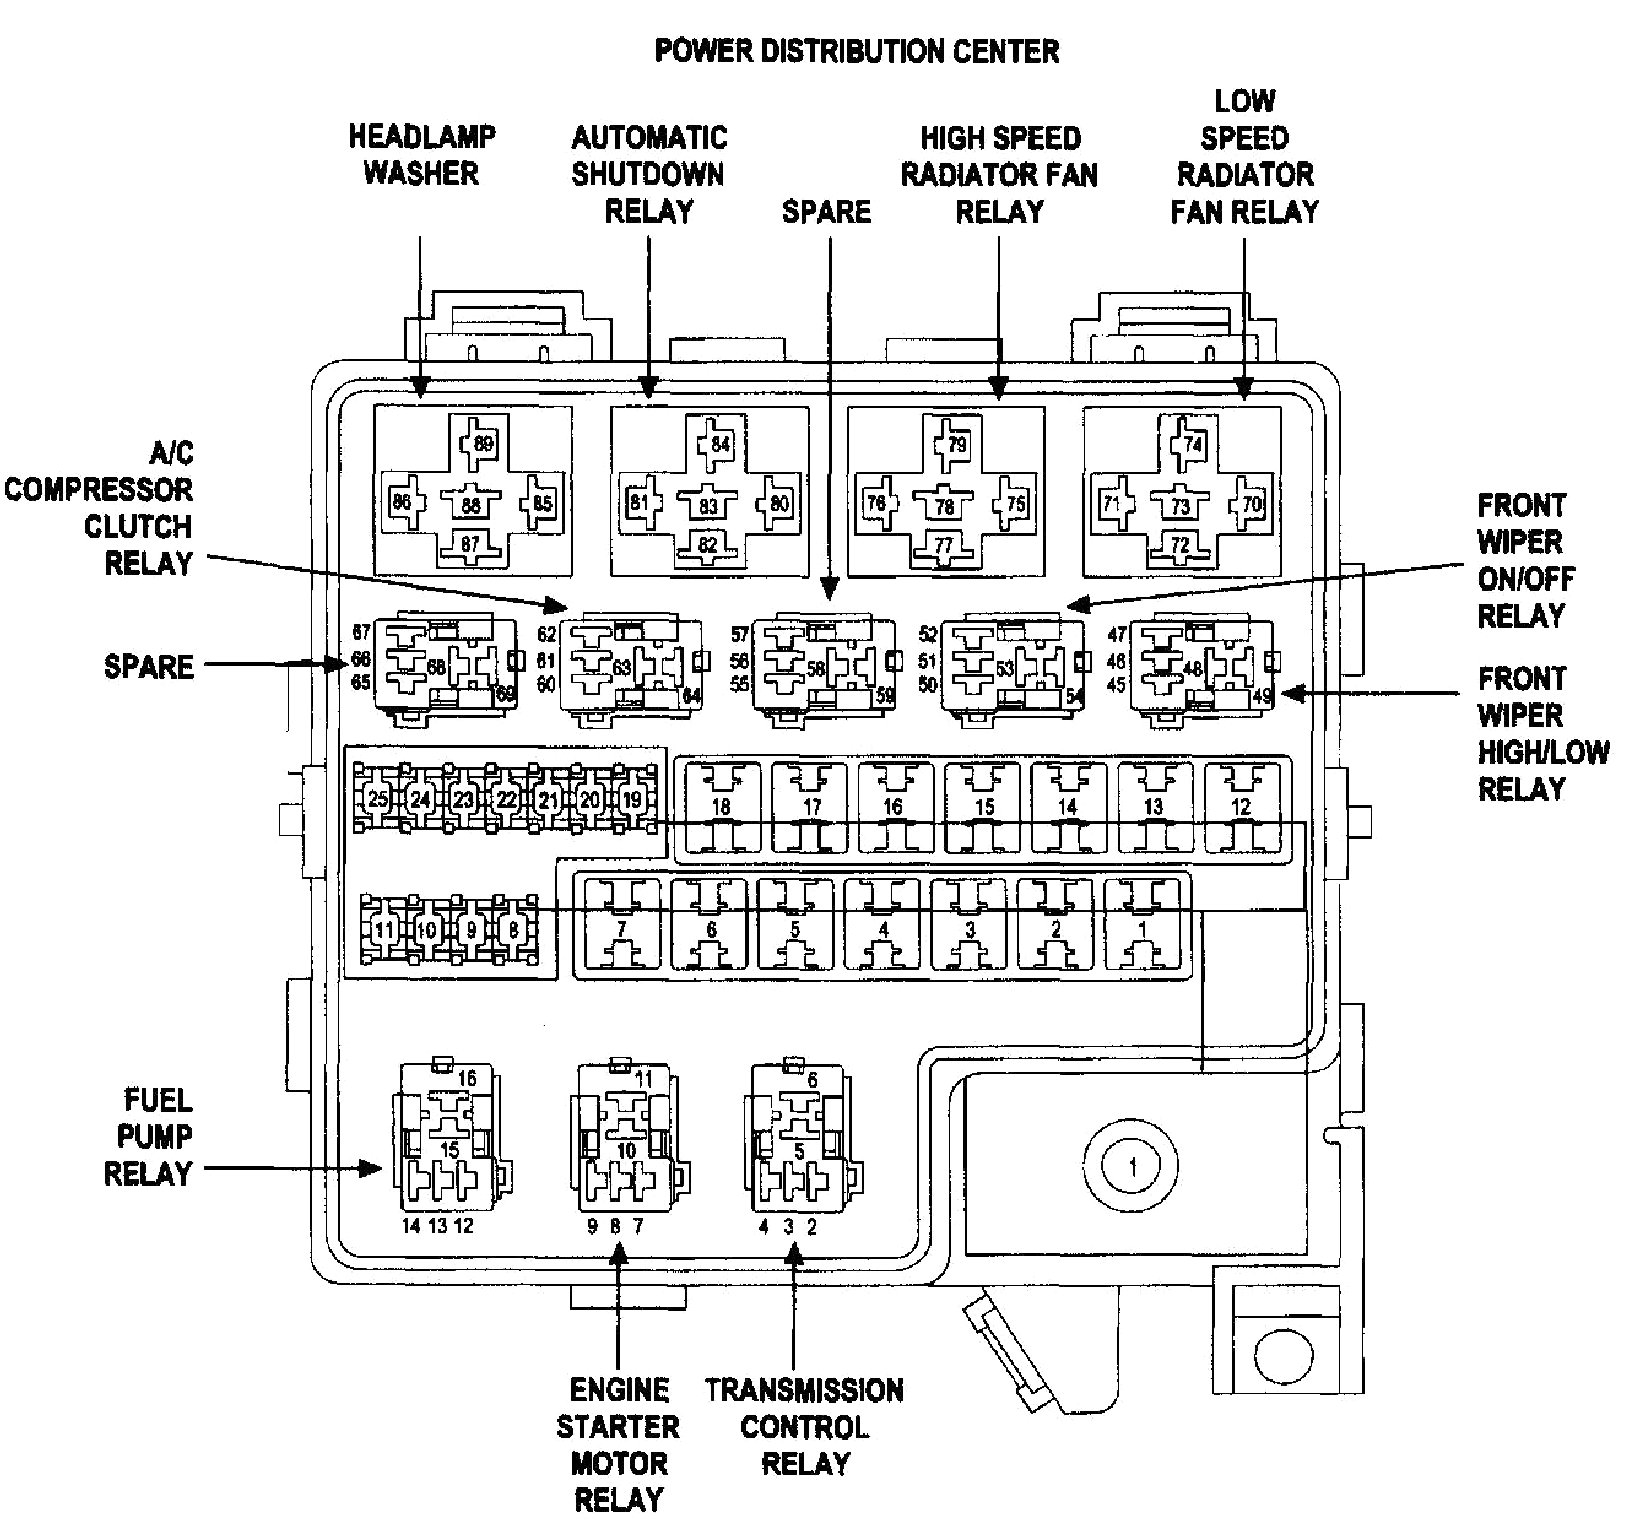 Dodge Avenger Fuse Box Diagram